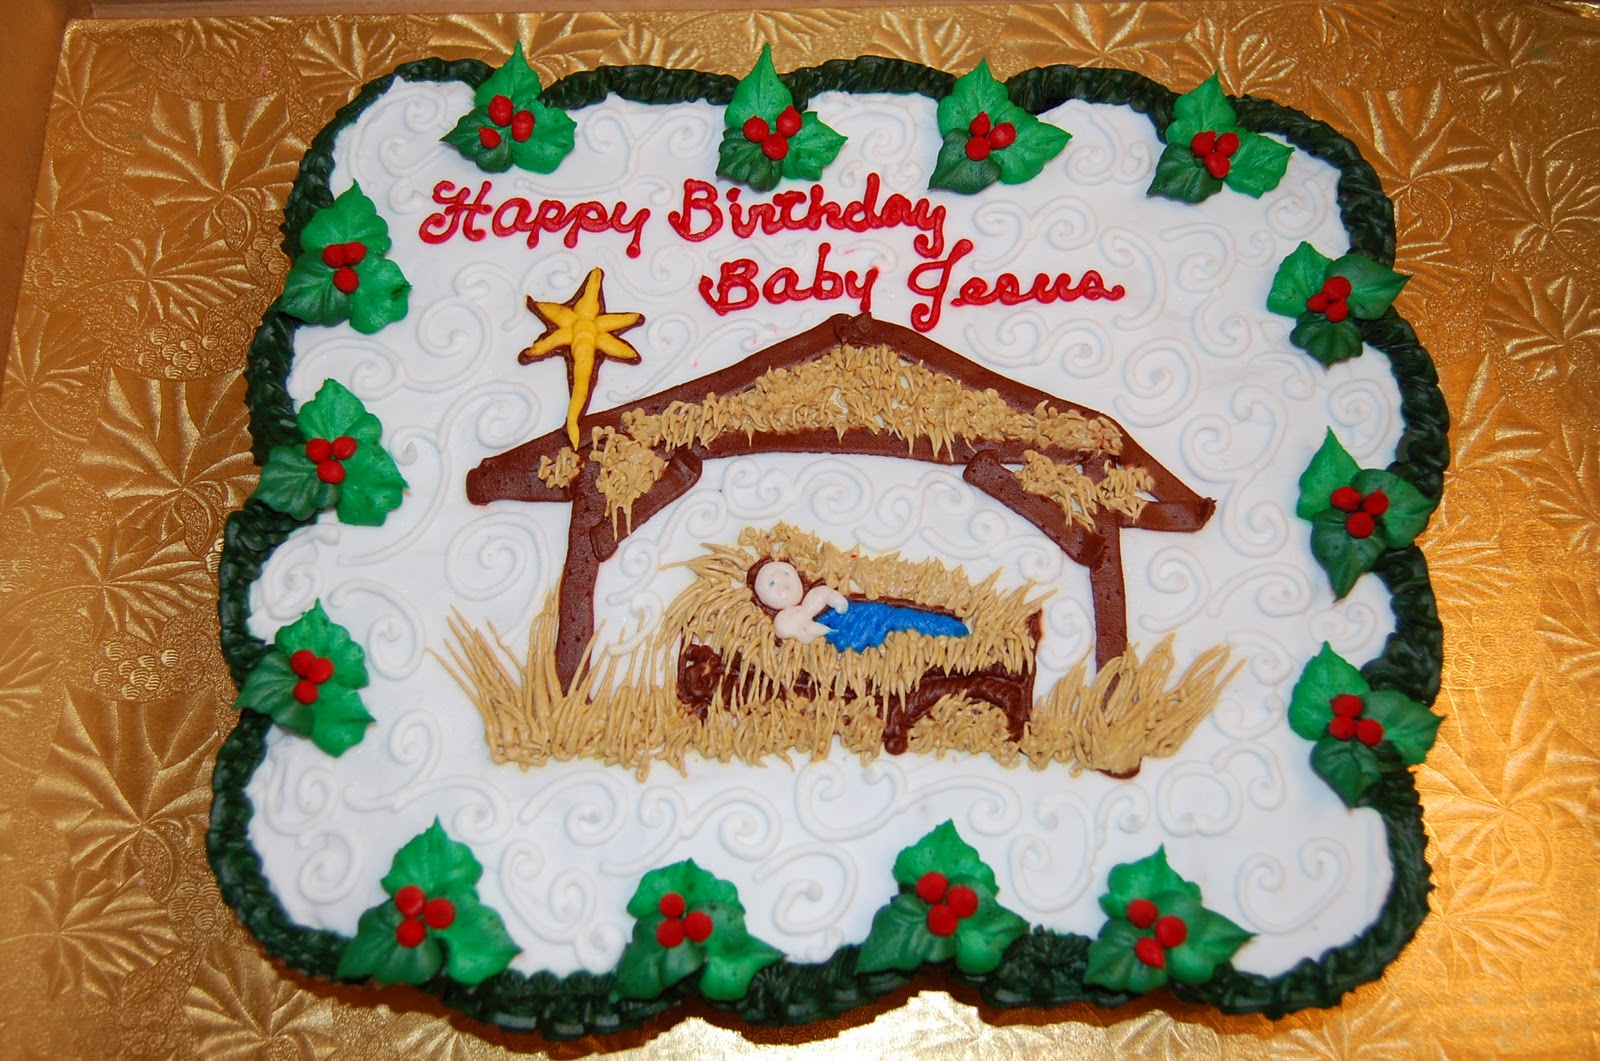 Bella Bambino Happy Birthday Baby Jesus Day